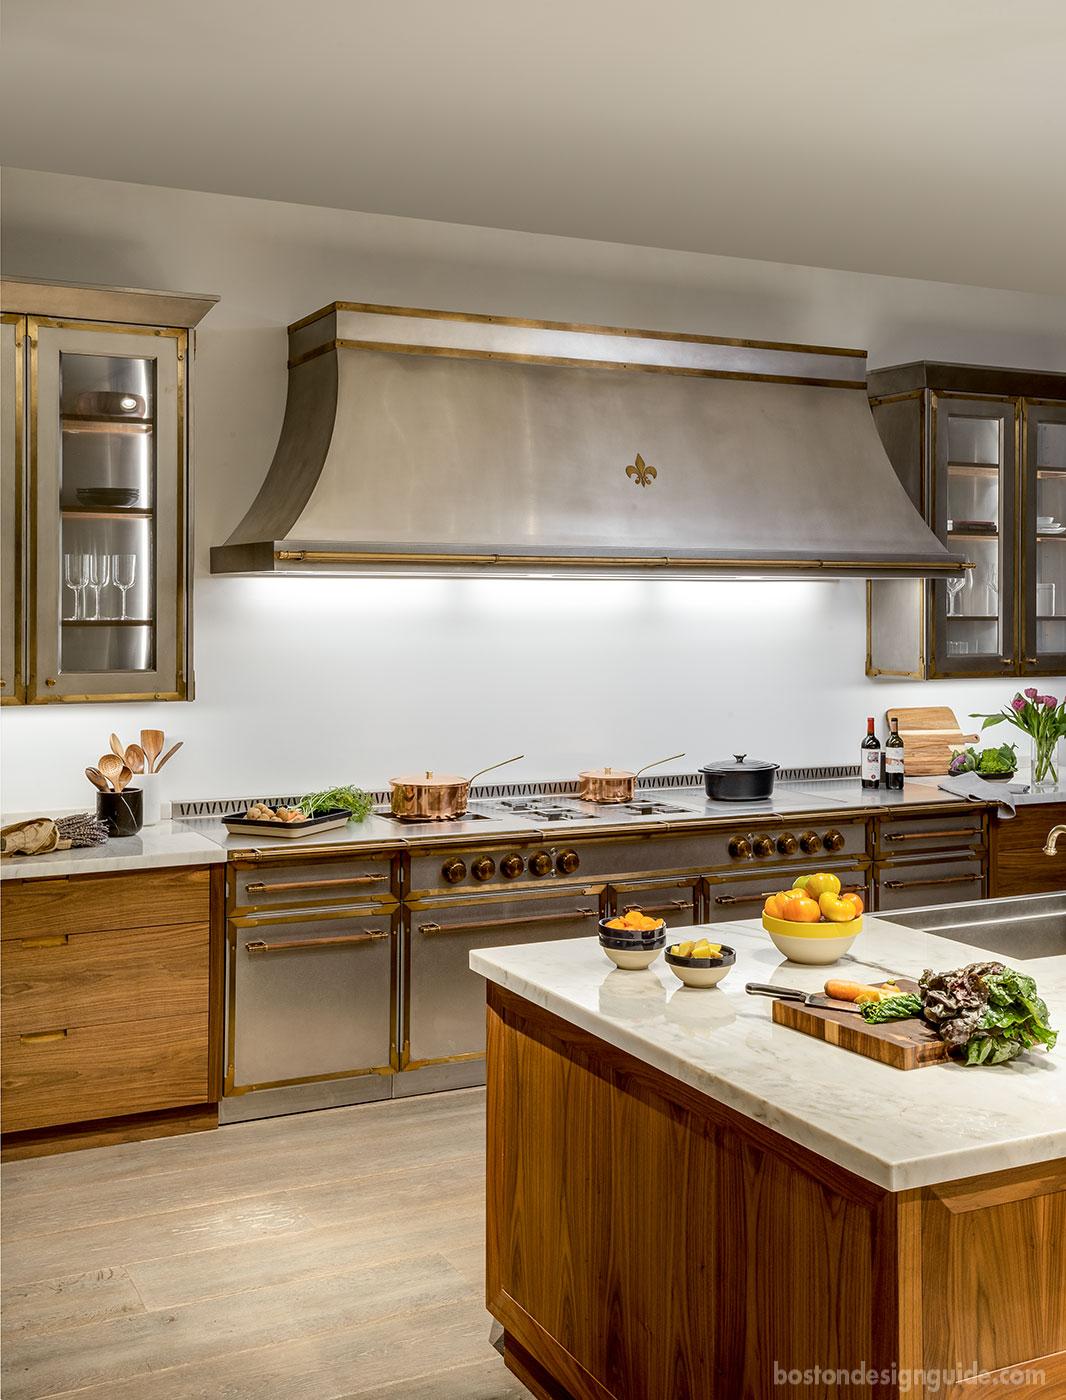 Luxury Range and Oven by L'Atelier Paris